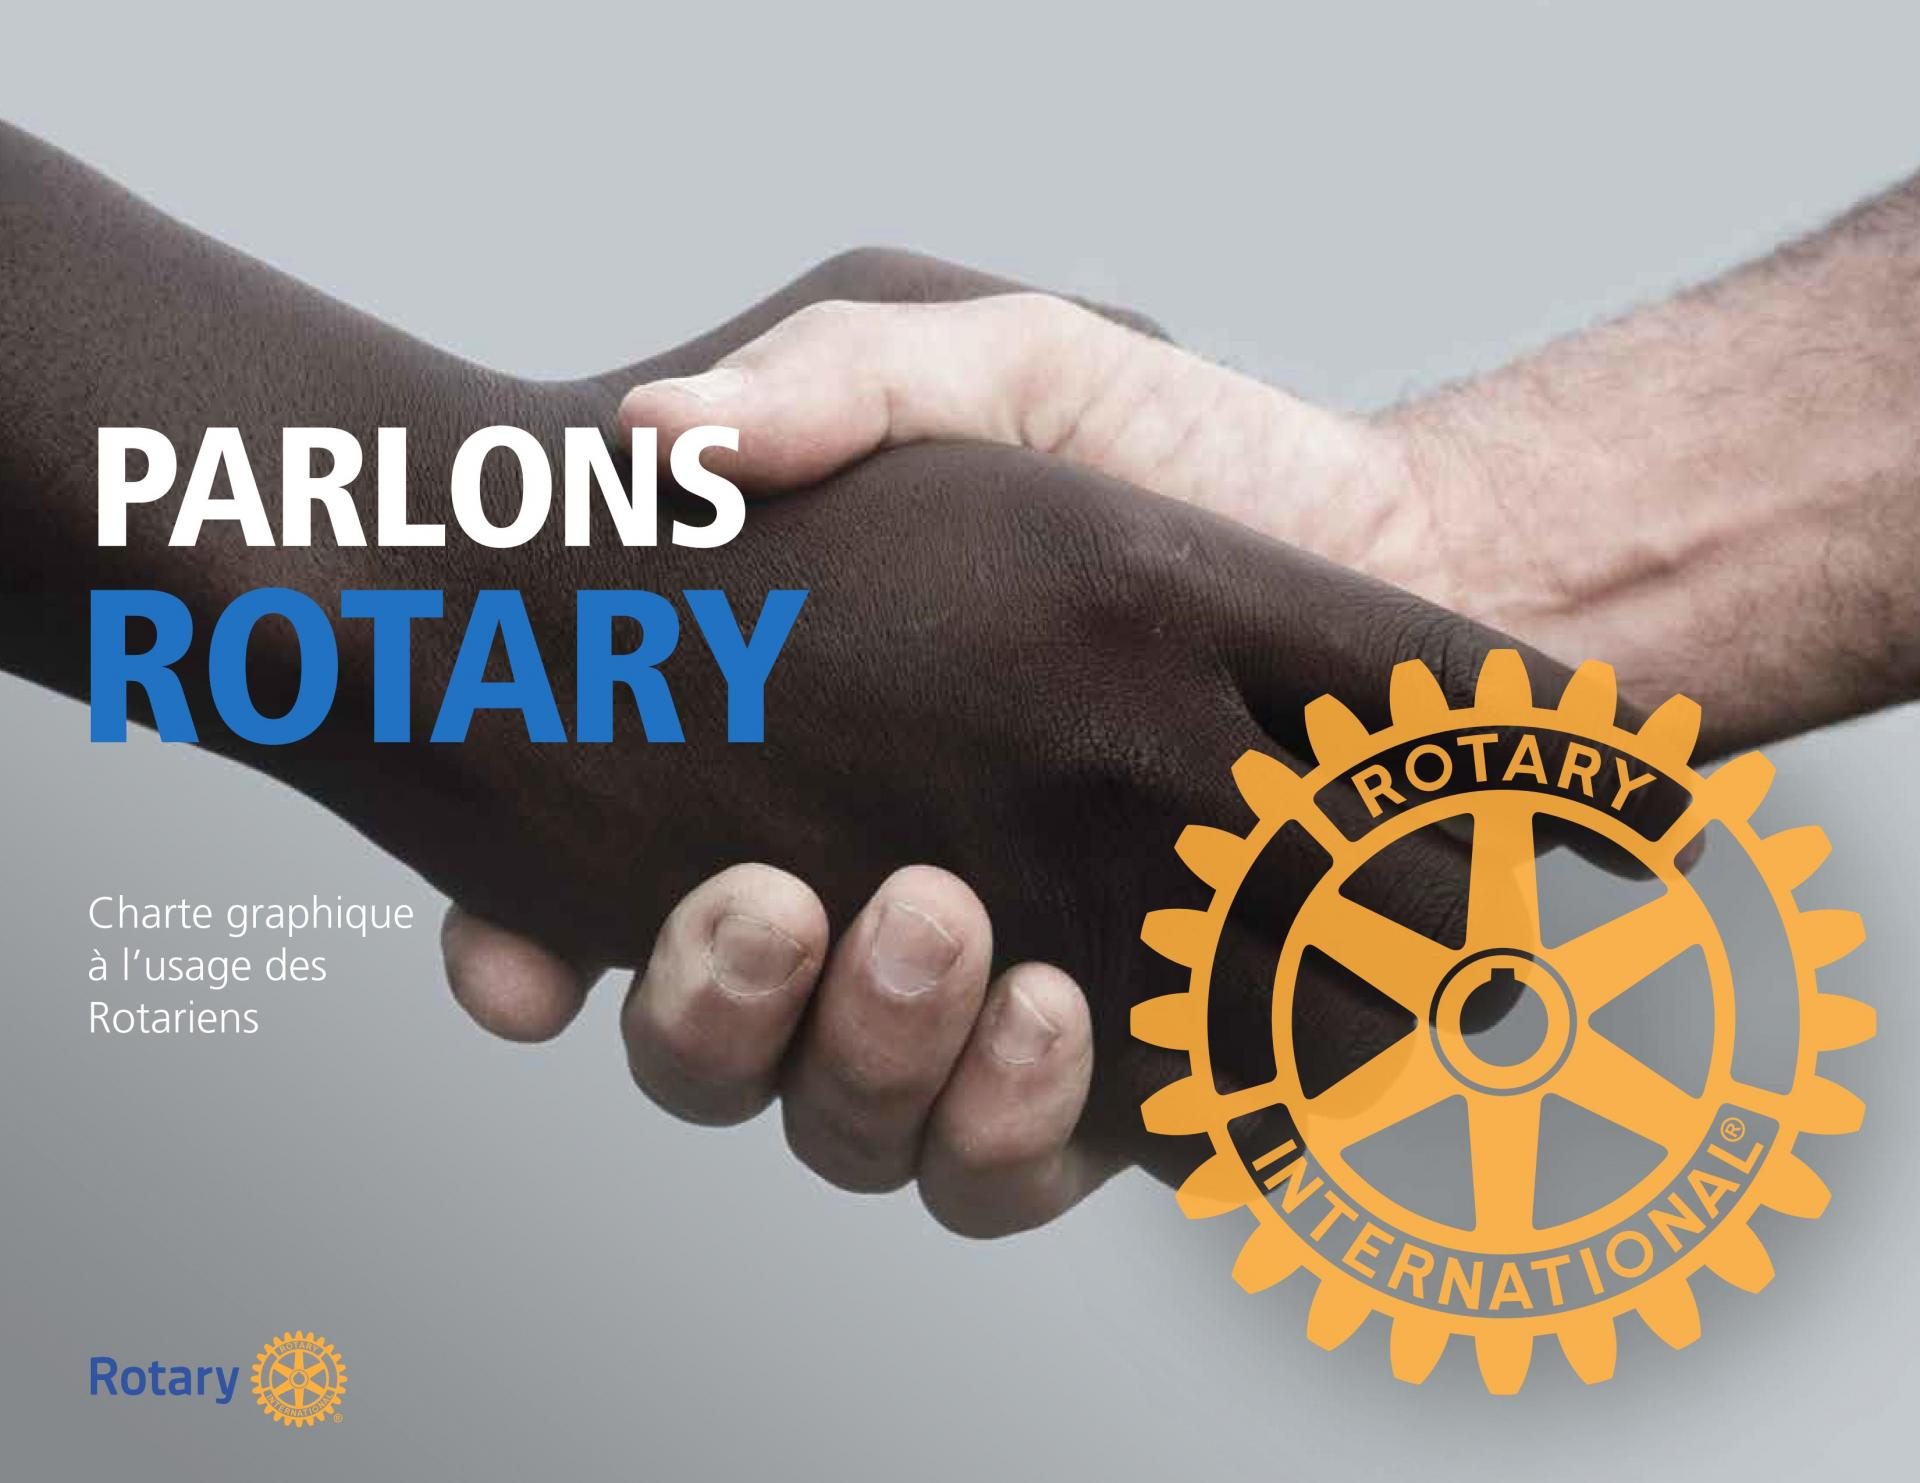 Rotary Club de Figeac-en-Quercy